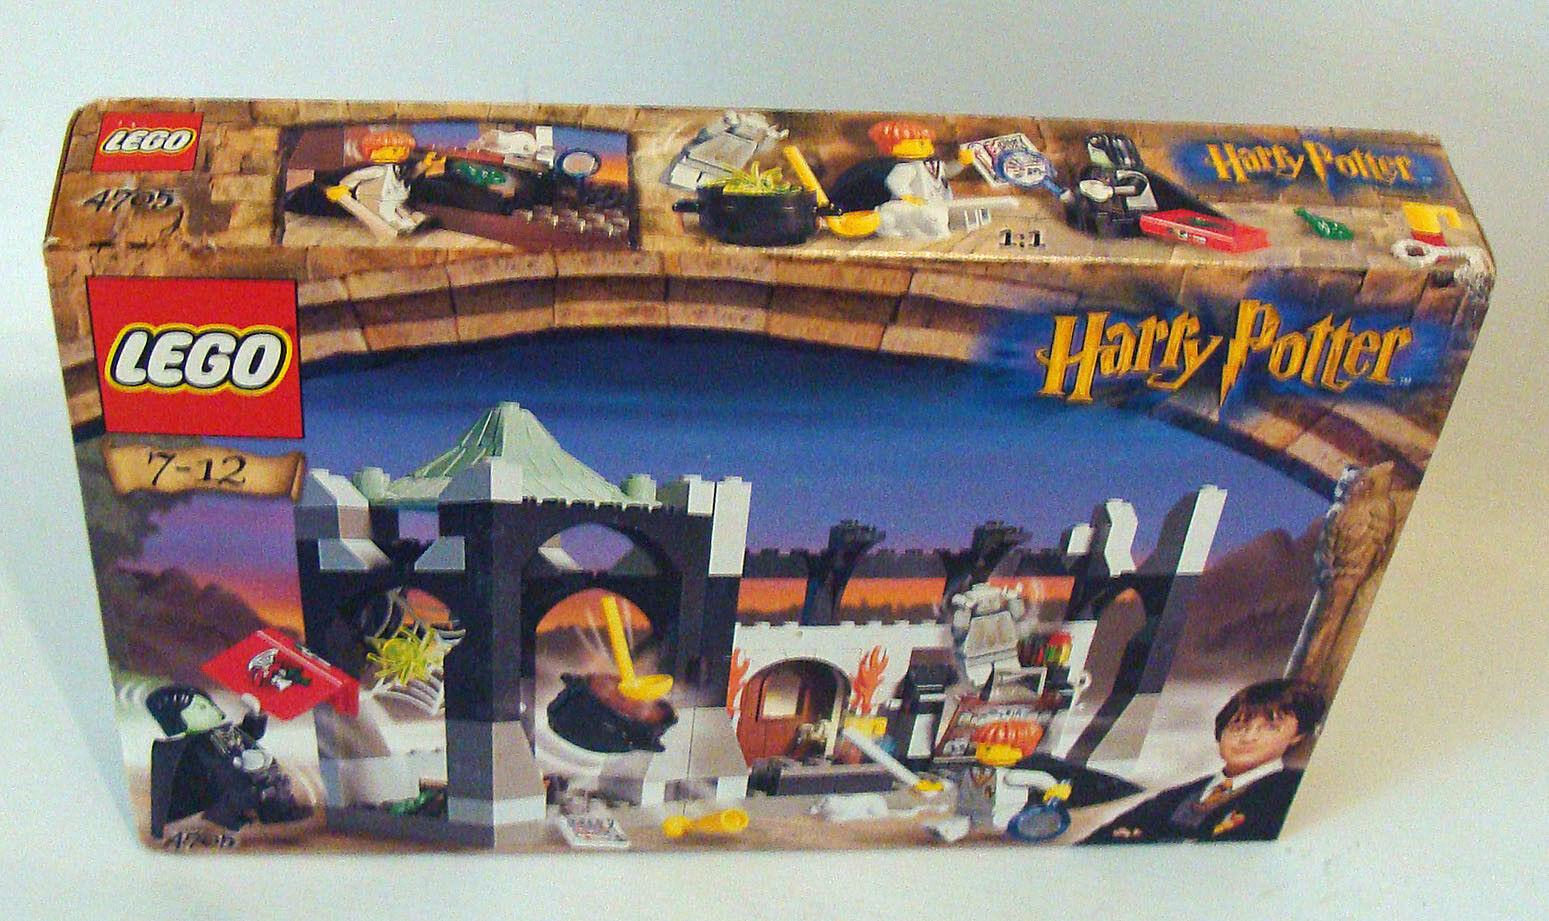 Lego® Harry Potter 4705 Unterricht bei Professor Snape 163 Teile 7-12 Jahren Neu